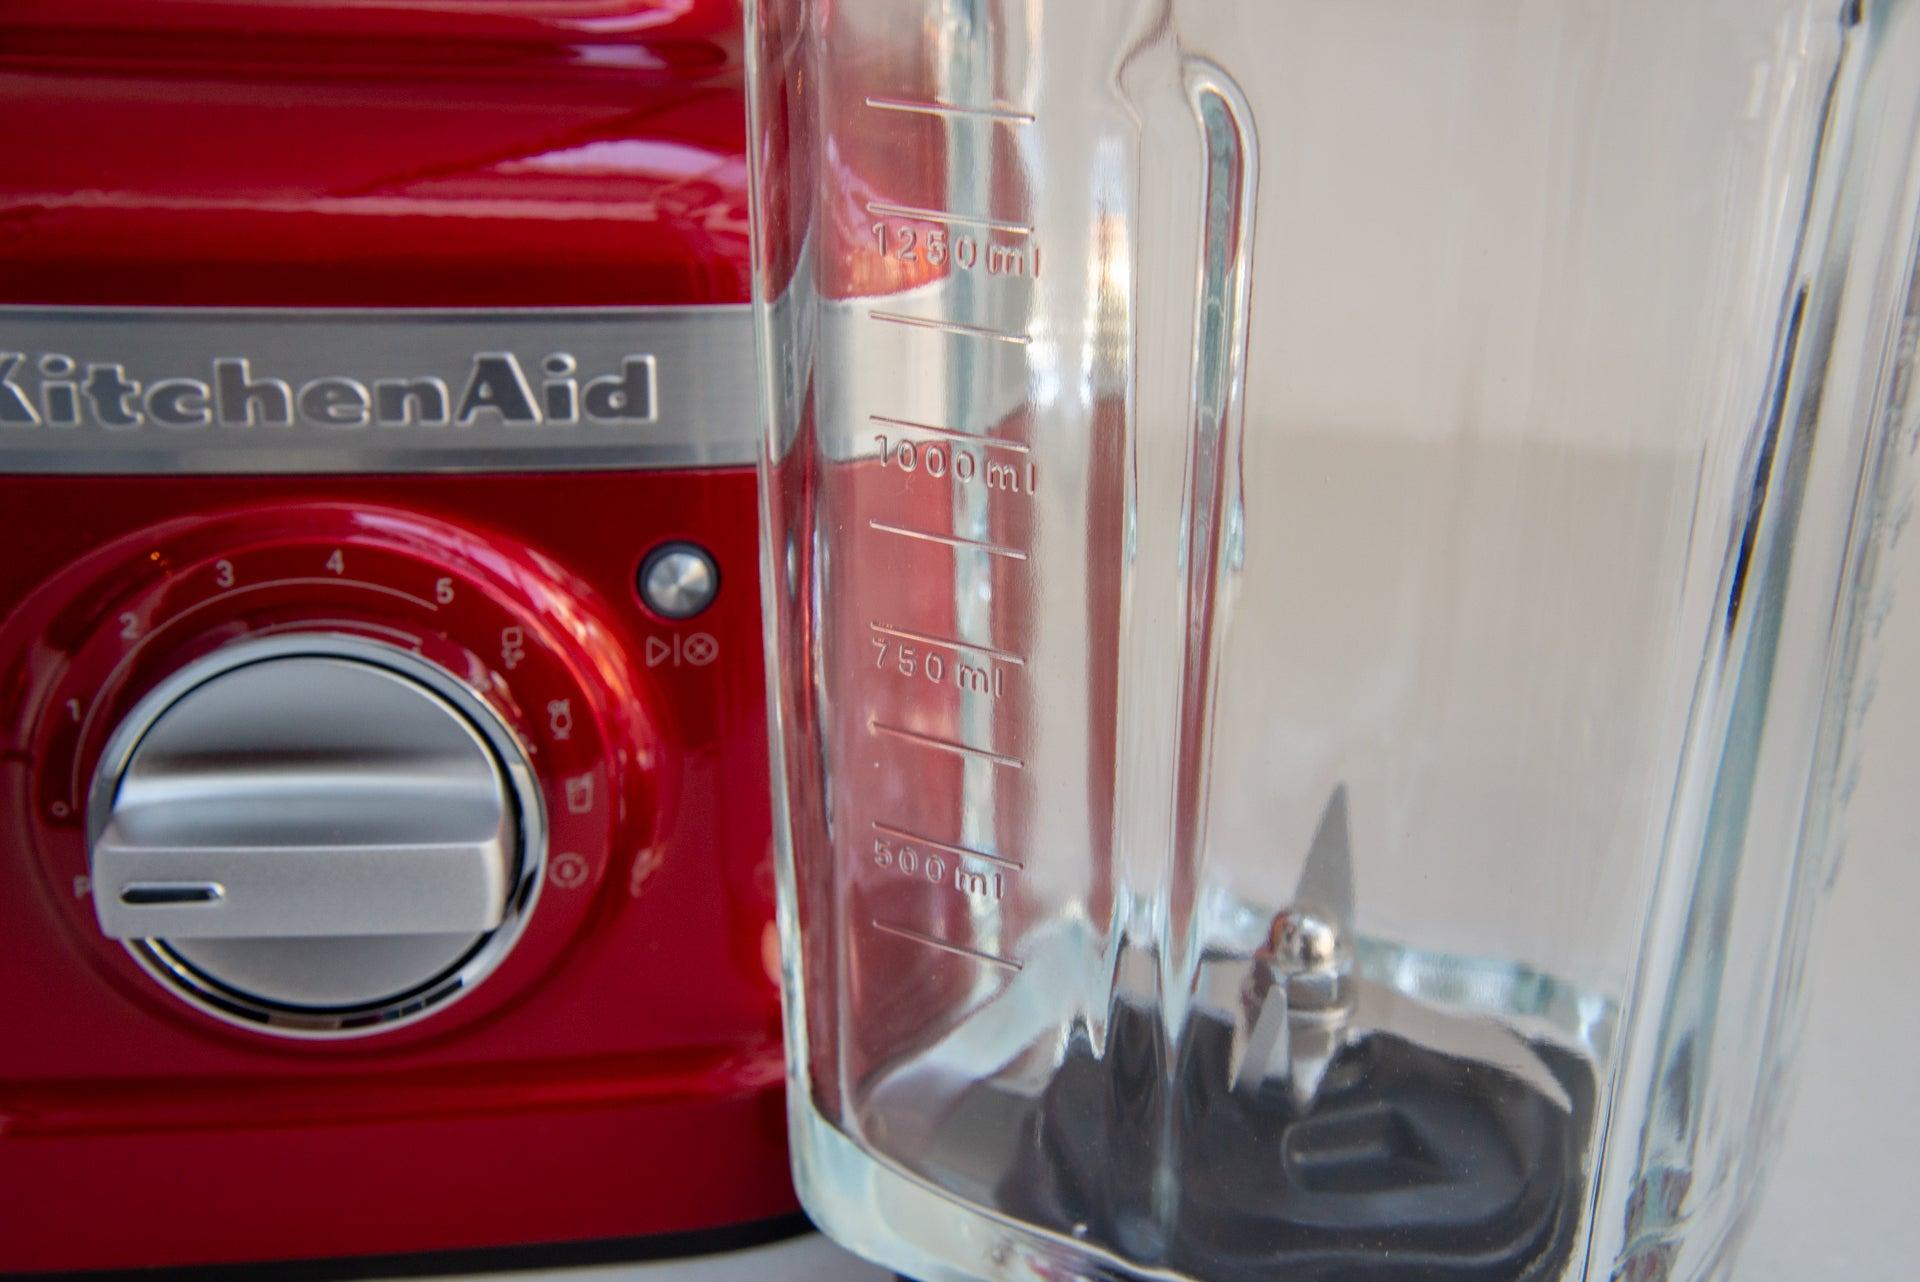 KitchenAid Artisan Blender K400 measuring marks